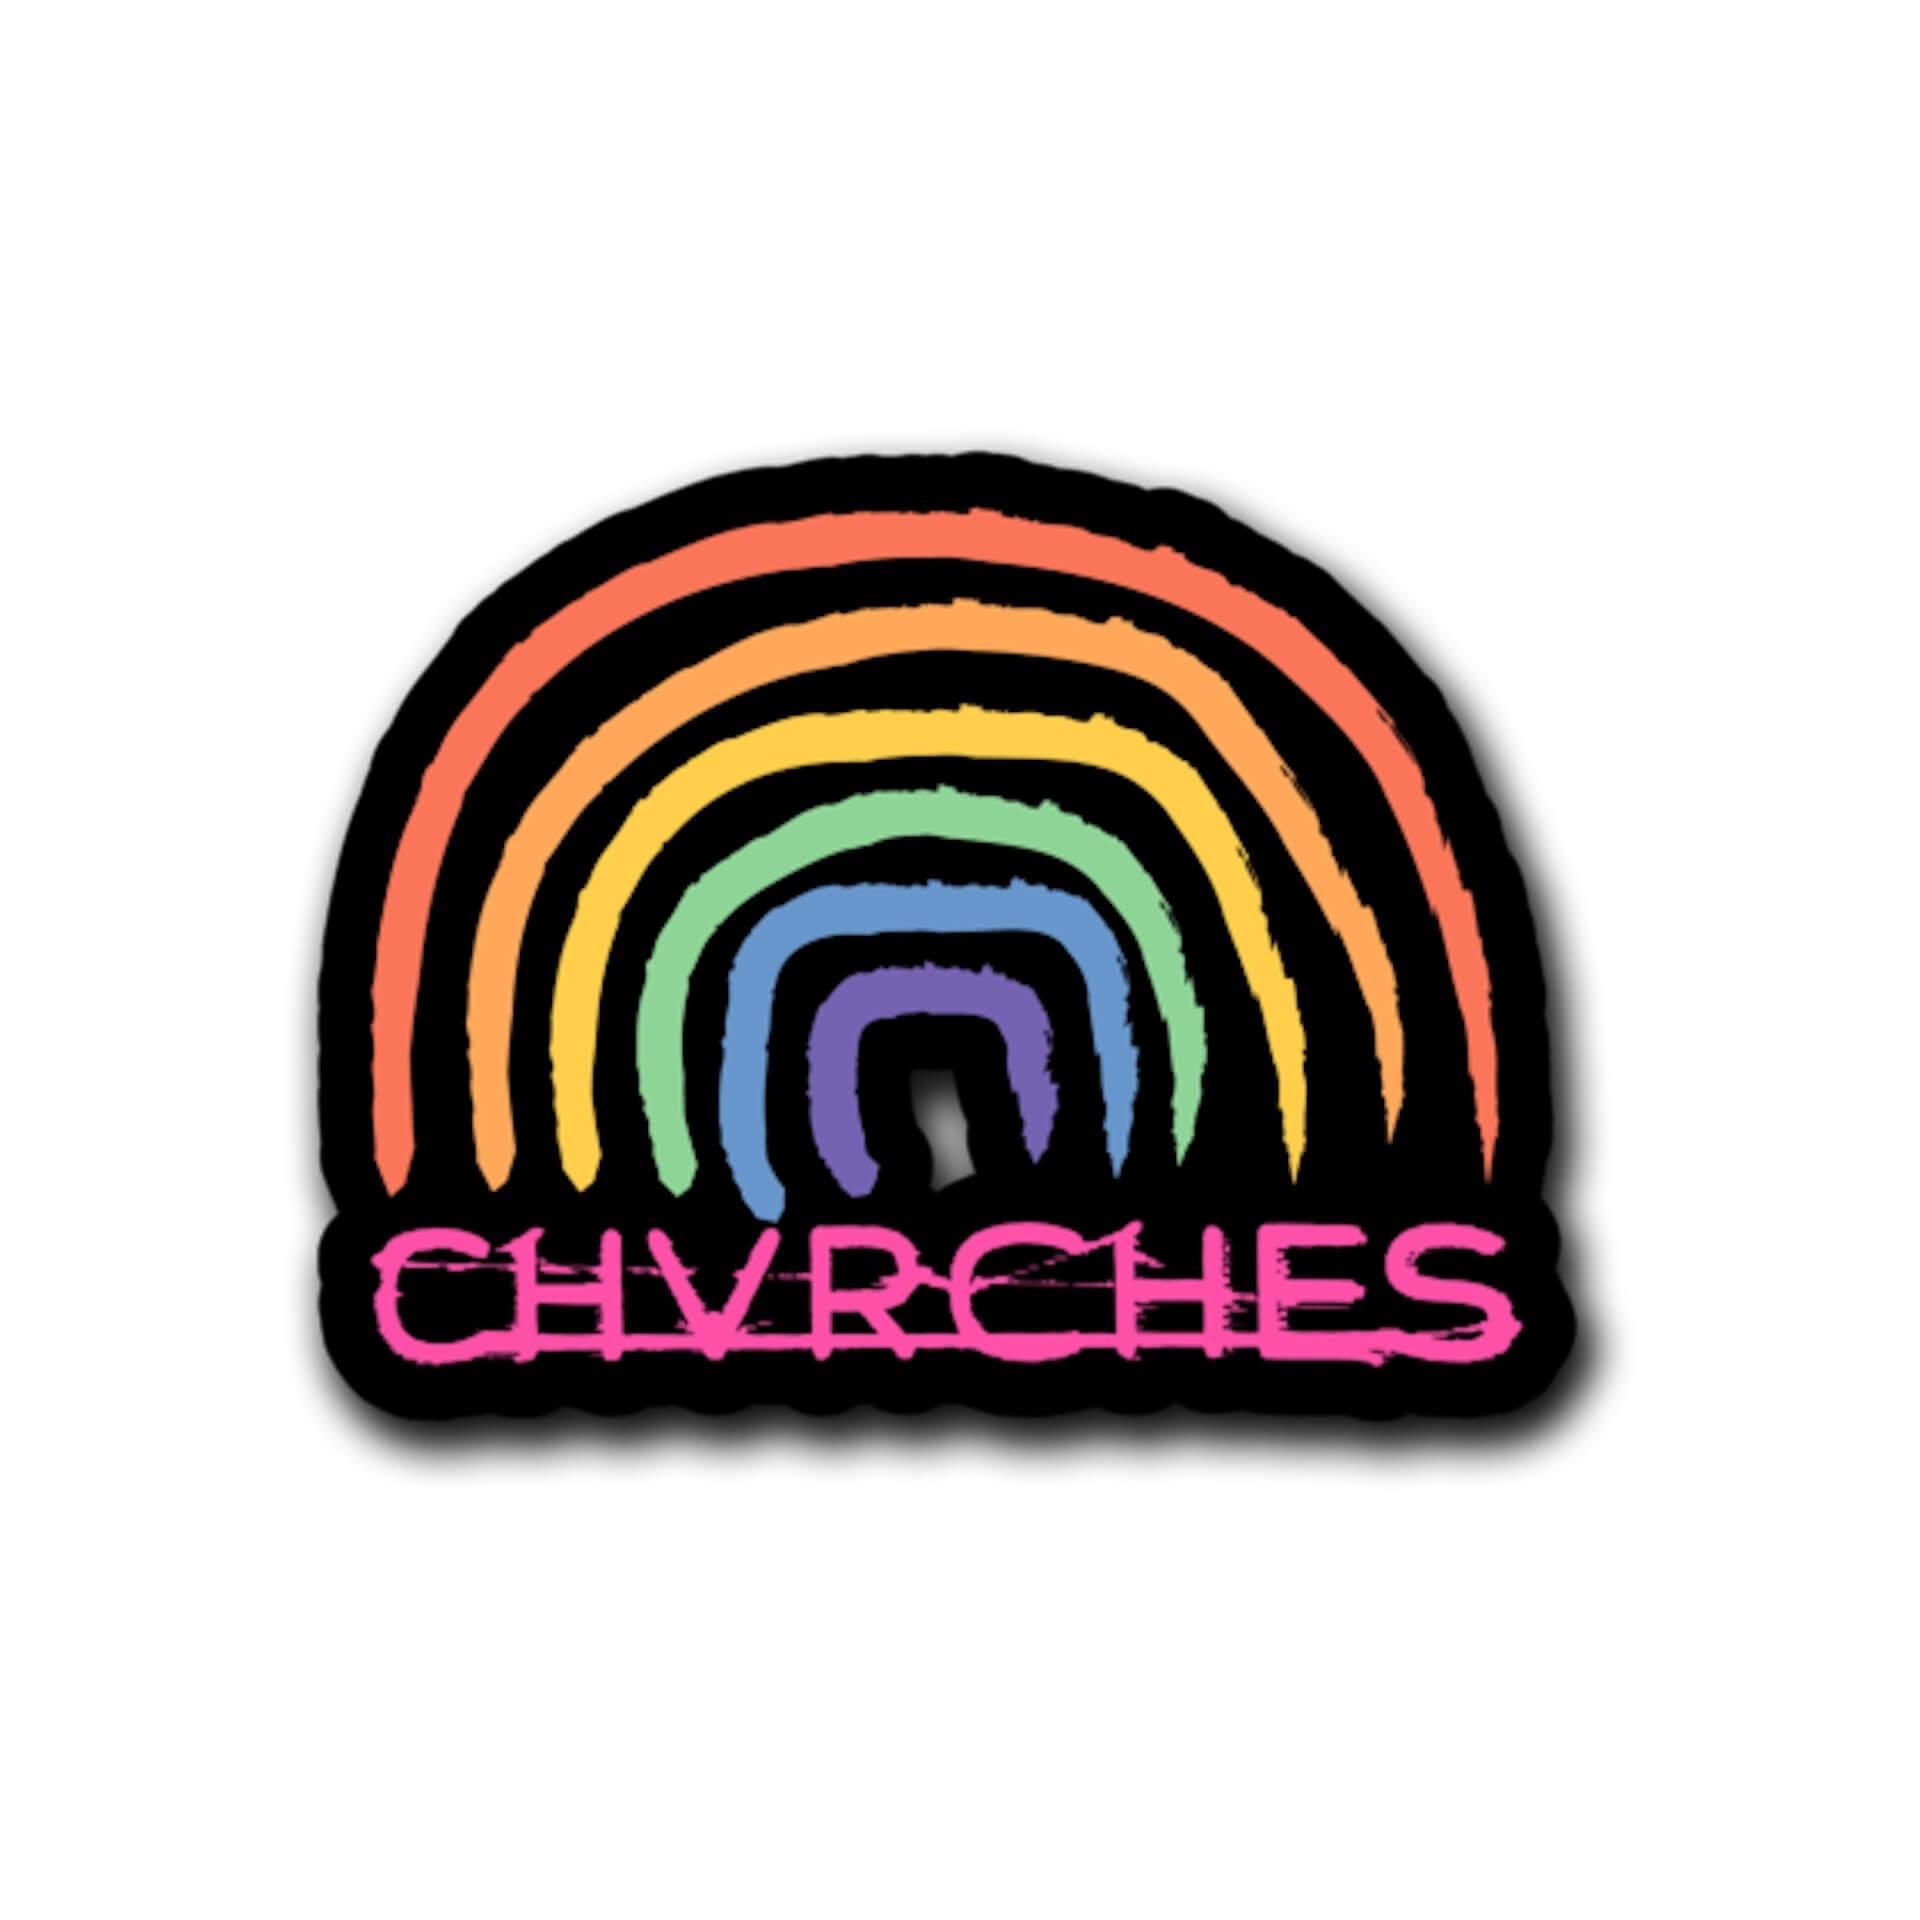 CHVRCHES最新アルバム『Screen Violence』発売記念!タワレコでサイン入り豪華特典が当たるキャンペーン実施決定 music210824_chvrches_8